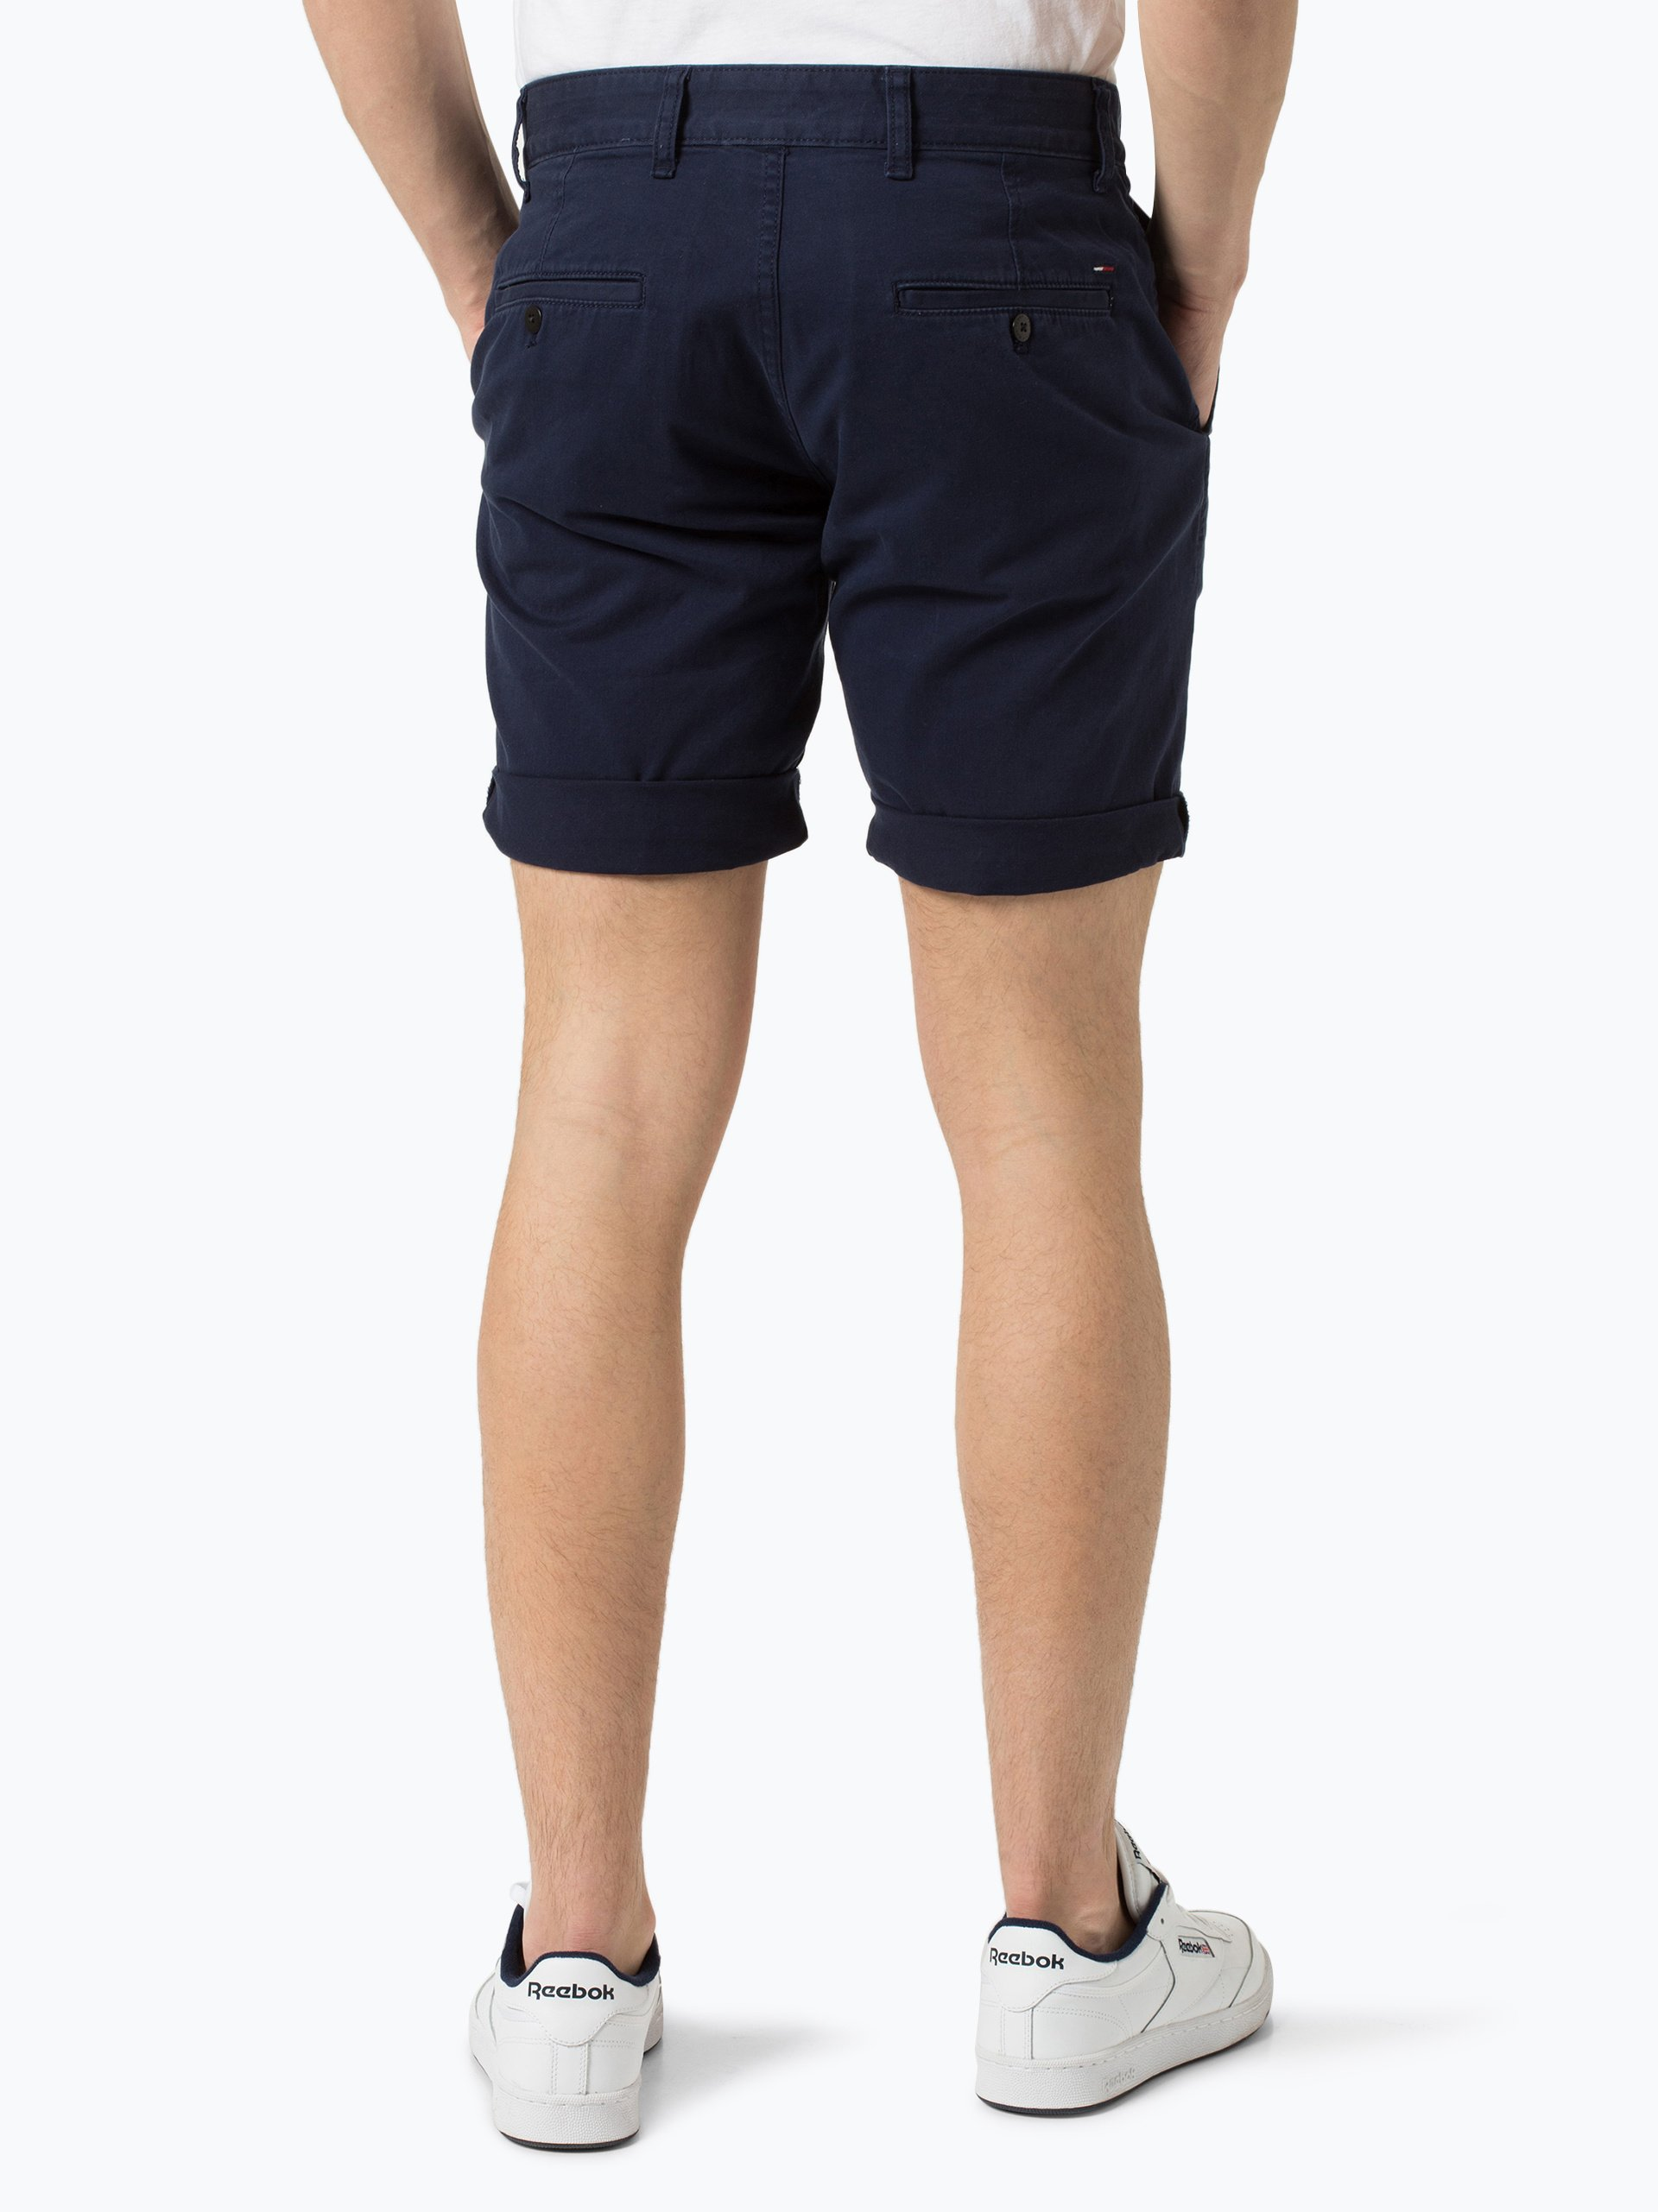 tommy jeans herren shorts marine uni online kaufen. Black Bedroom Furniture Sets. Home Design Ideas